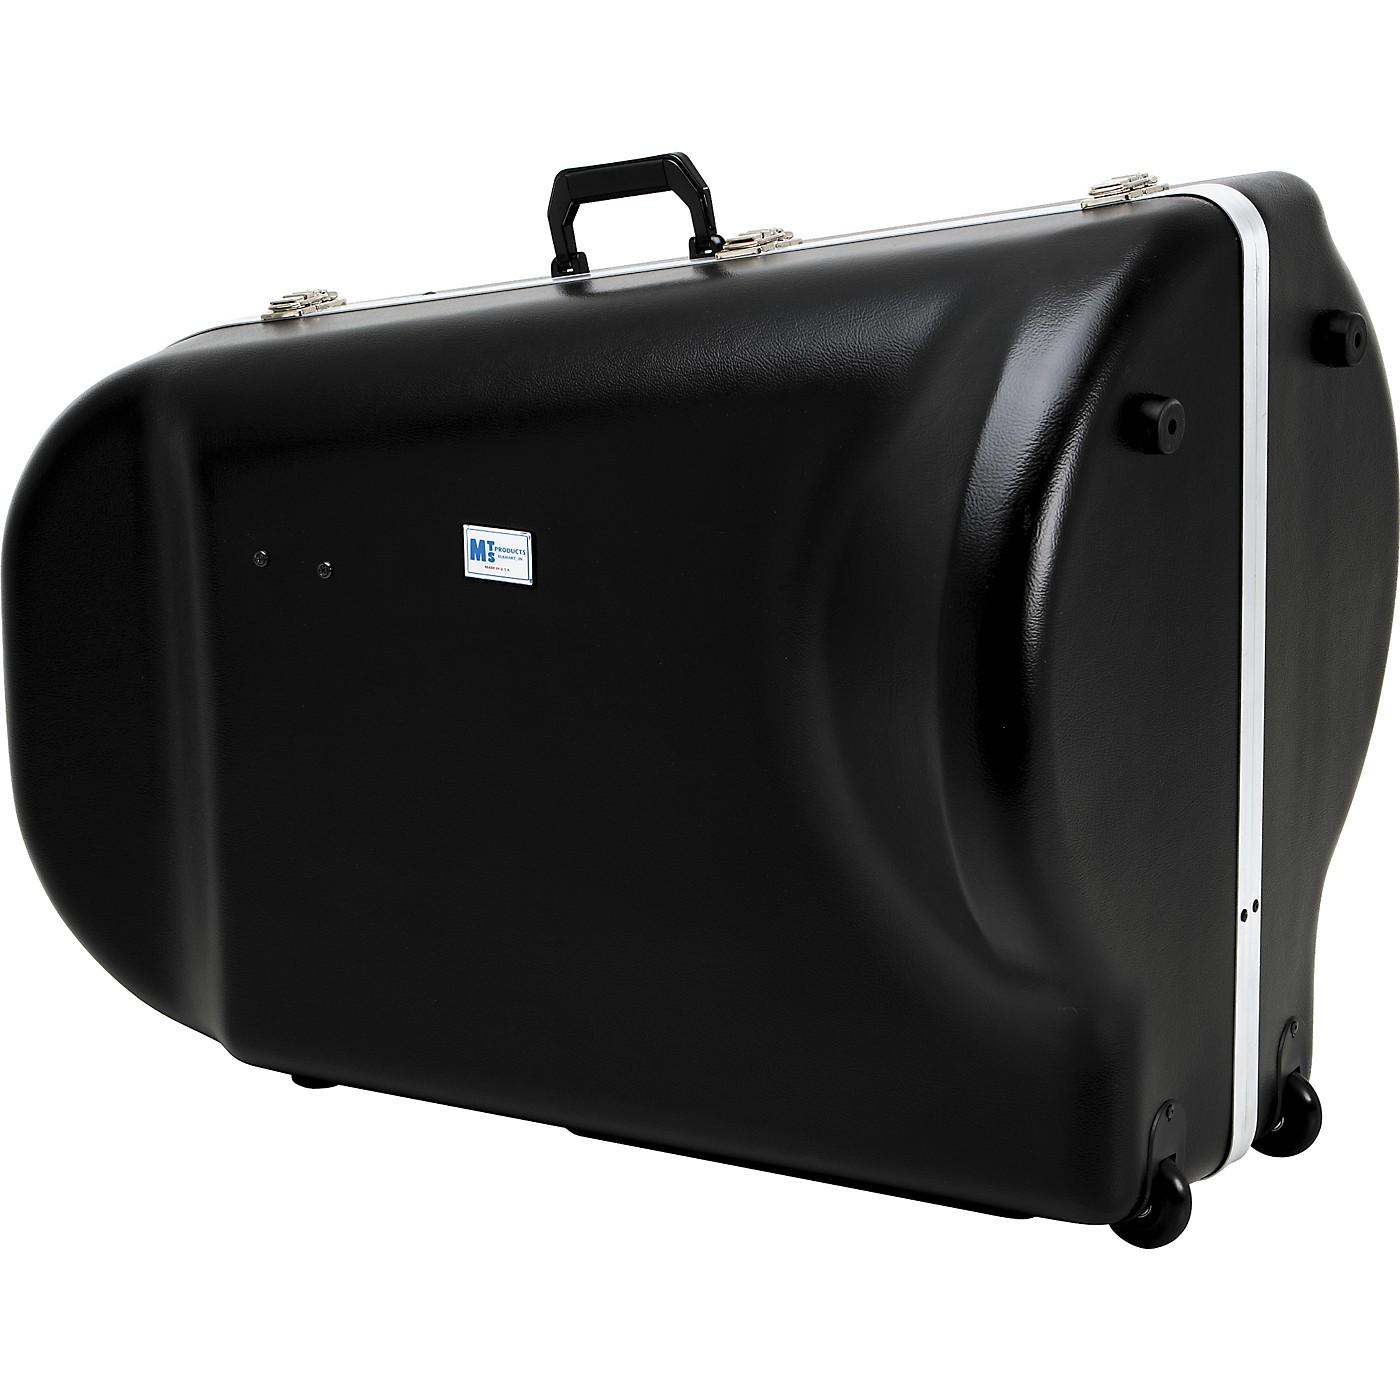 MTS Products 1204V F Tuba Case thumbnail